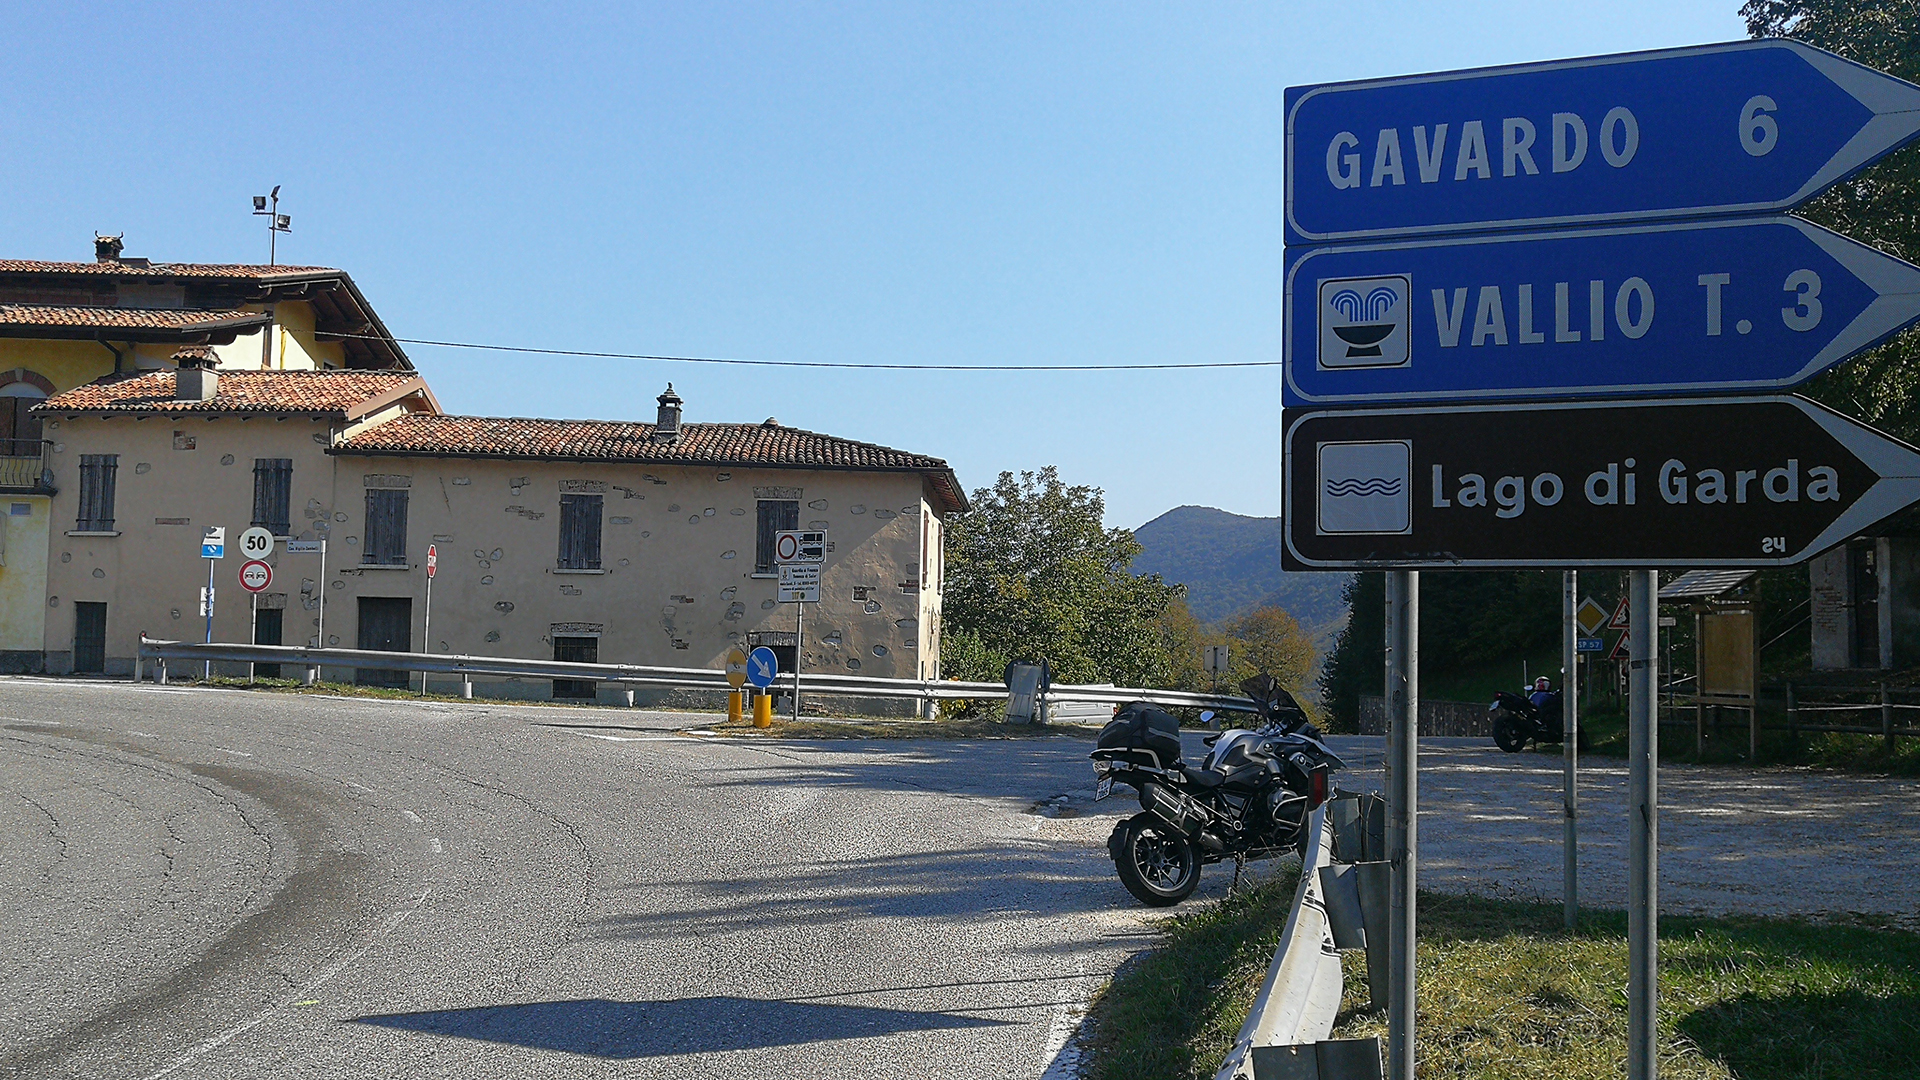 0574 - I - Colle Sant' Eusebio